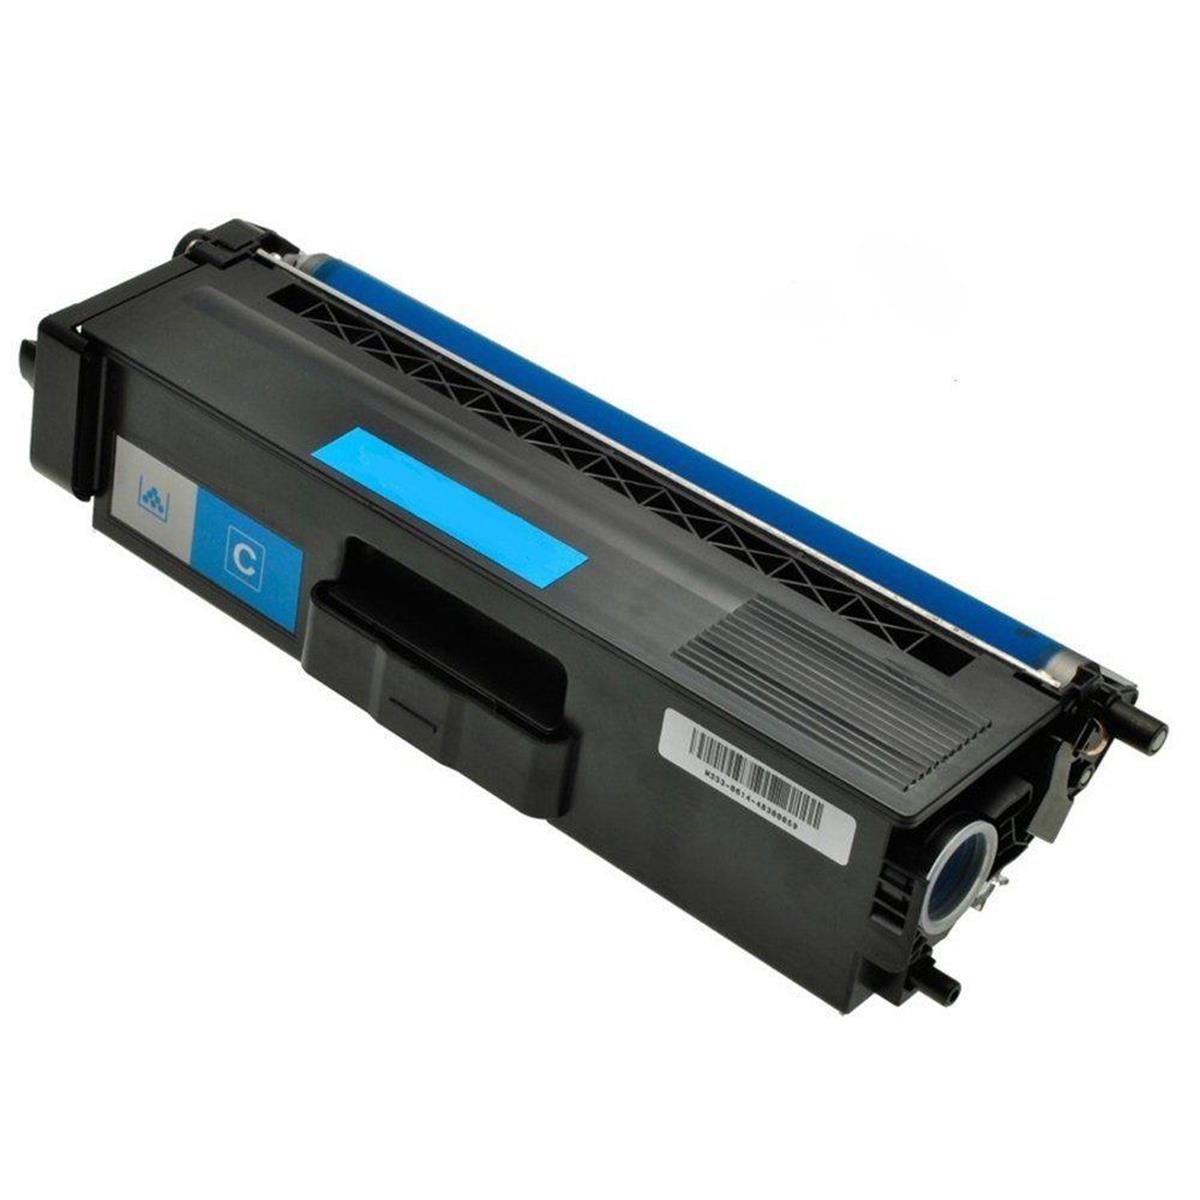 Toner TN-221C TN221 Ciano | HL3140 HL3170 DCP9020 MFC9130 MFC9330 MFC9020 | Premium 1.4k